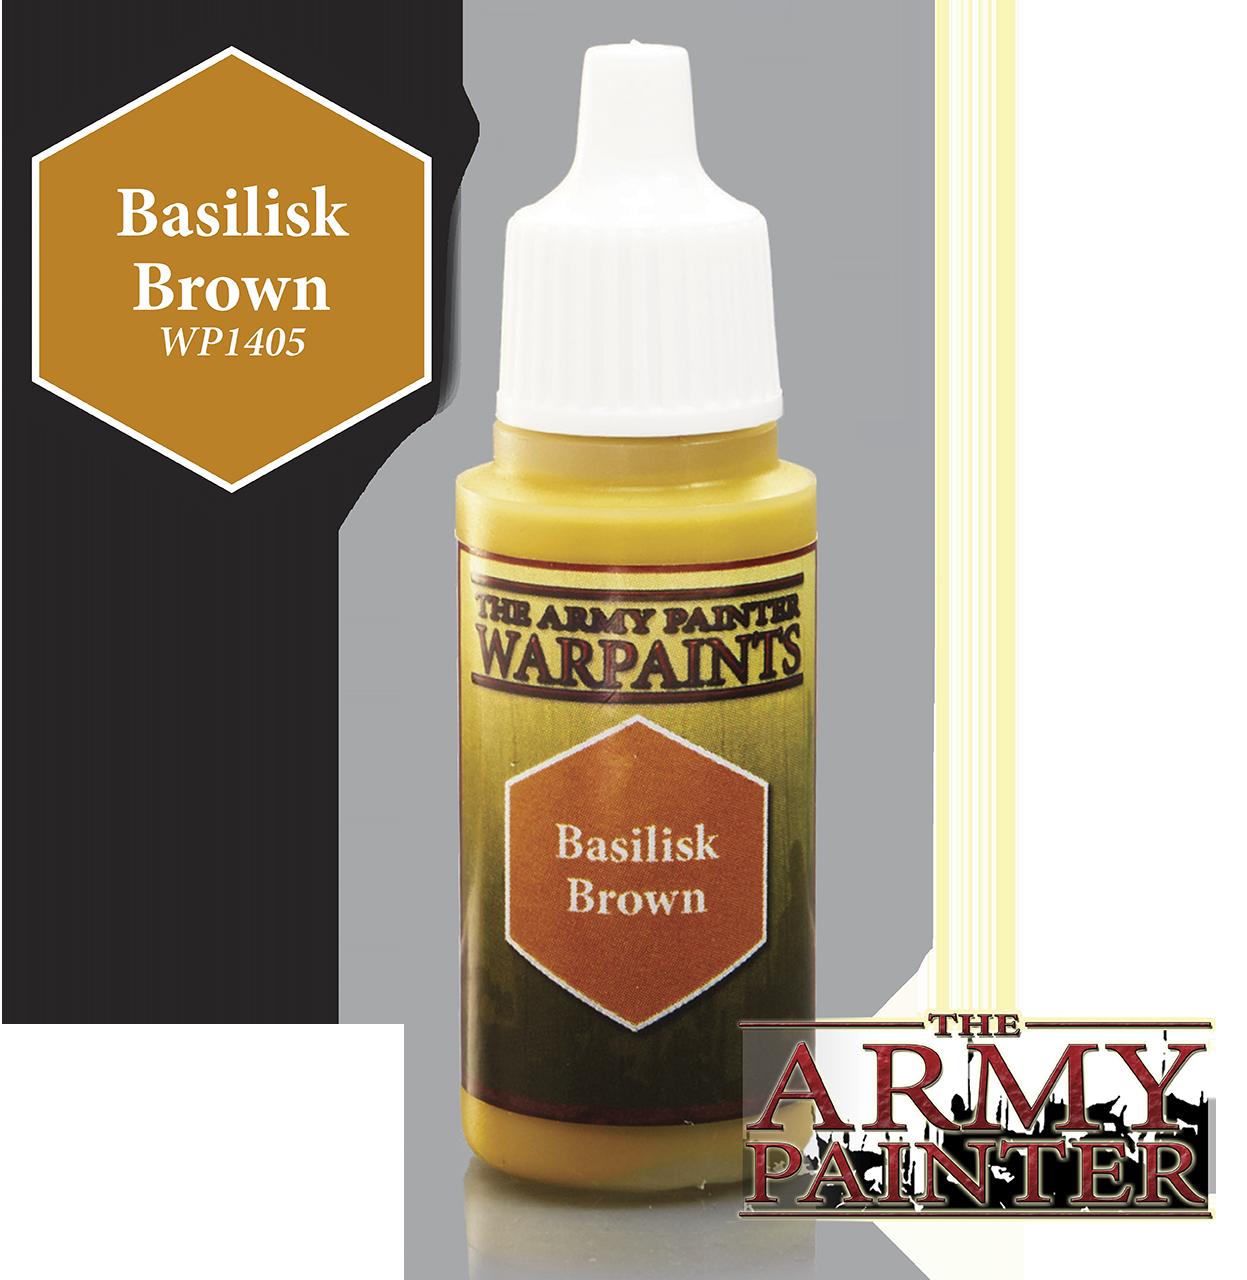 Basilisk Brown - Army Painter Warpaints